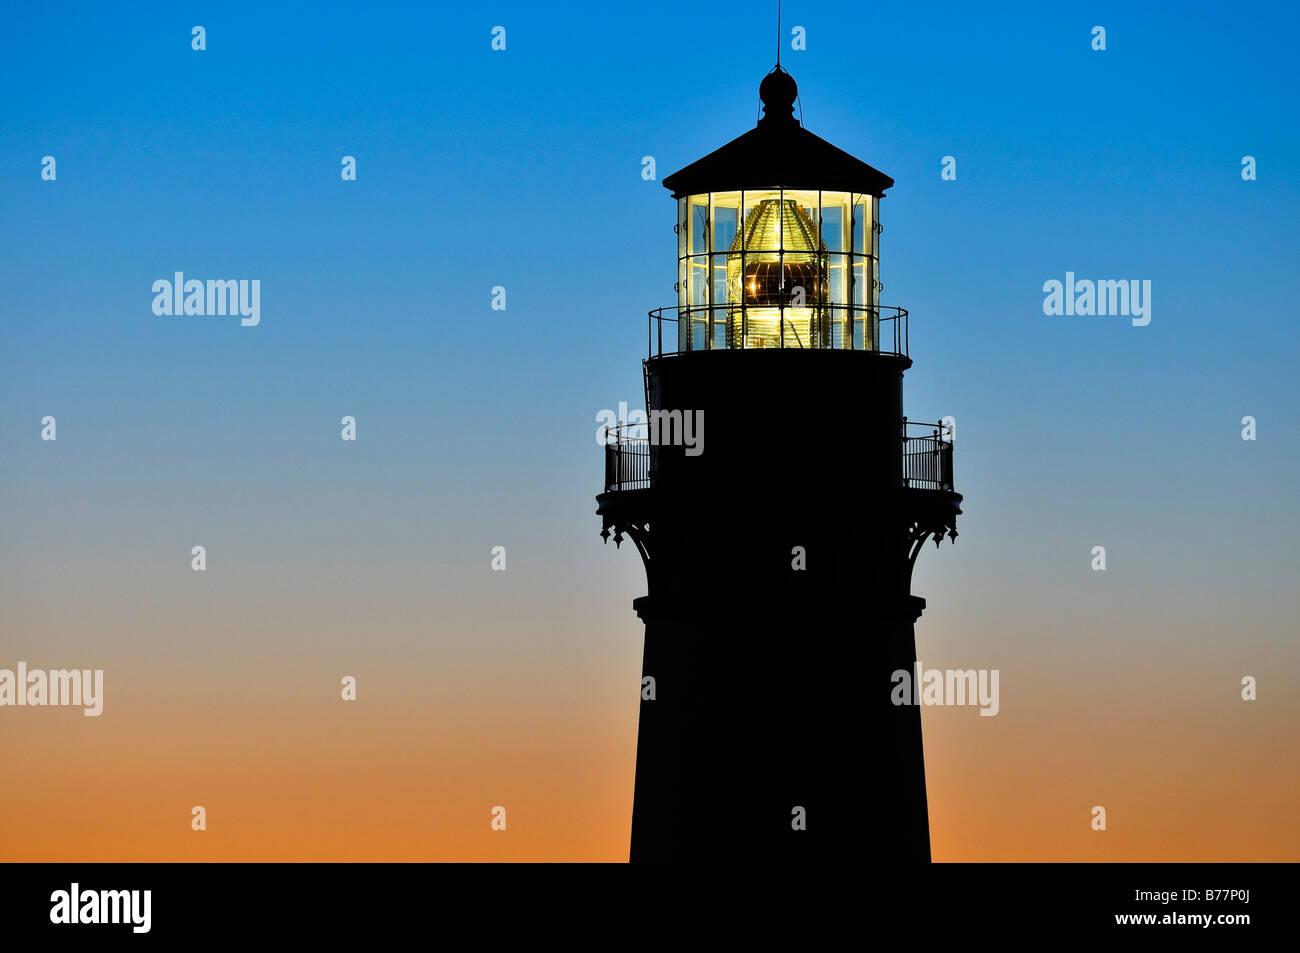 Yaquina Head Lighthouse, höchste Leuchtturm in Oregon, 28,5 m Punkt von Interesse, Yaquina Head, Oregon, USA, Stockbild